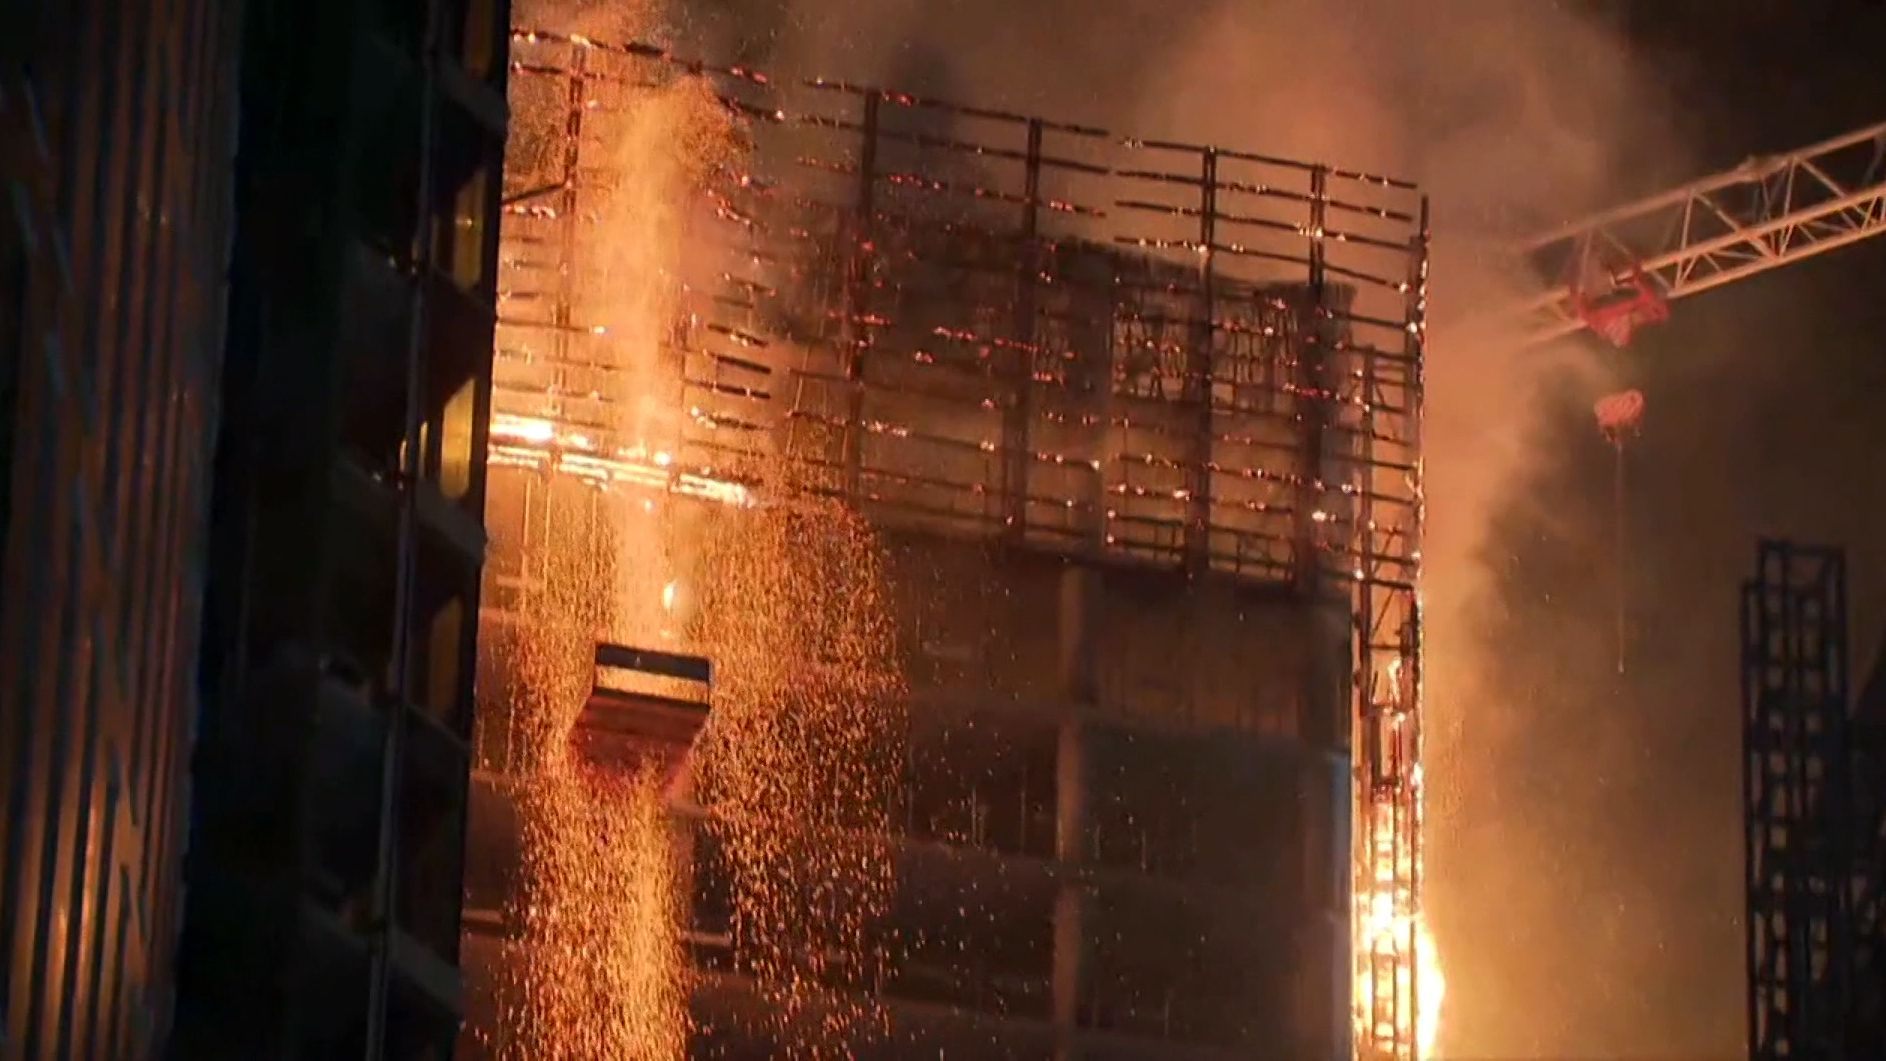 Hochhausbrand in Warschau: Feuer in hundert Metern Höhe